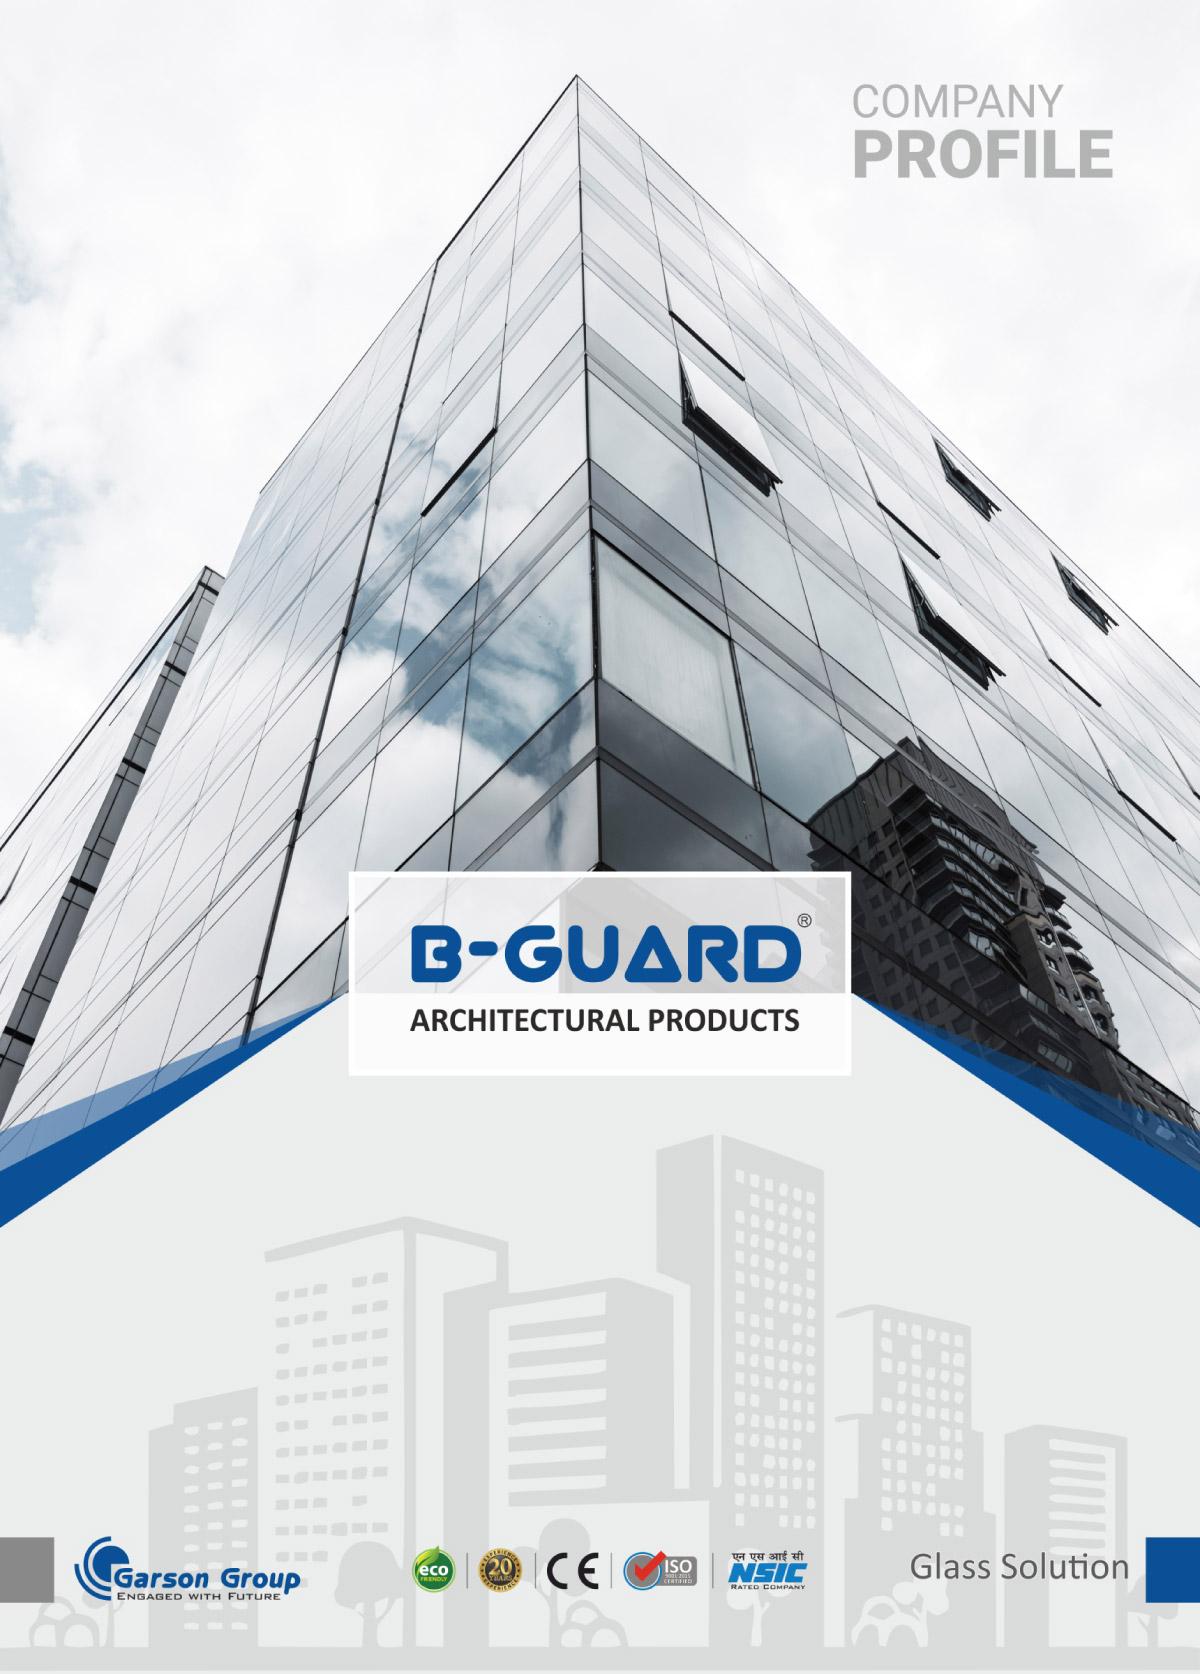 B-Guard-Glass-Solution-Comp